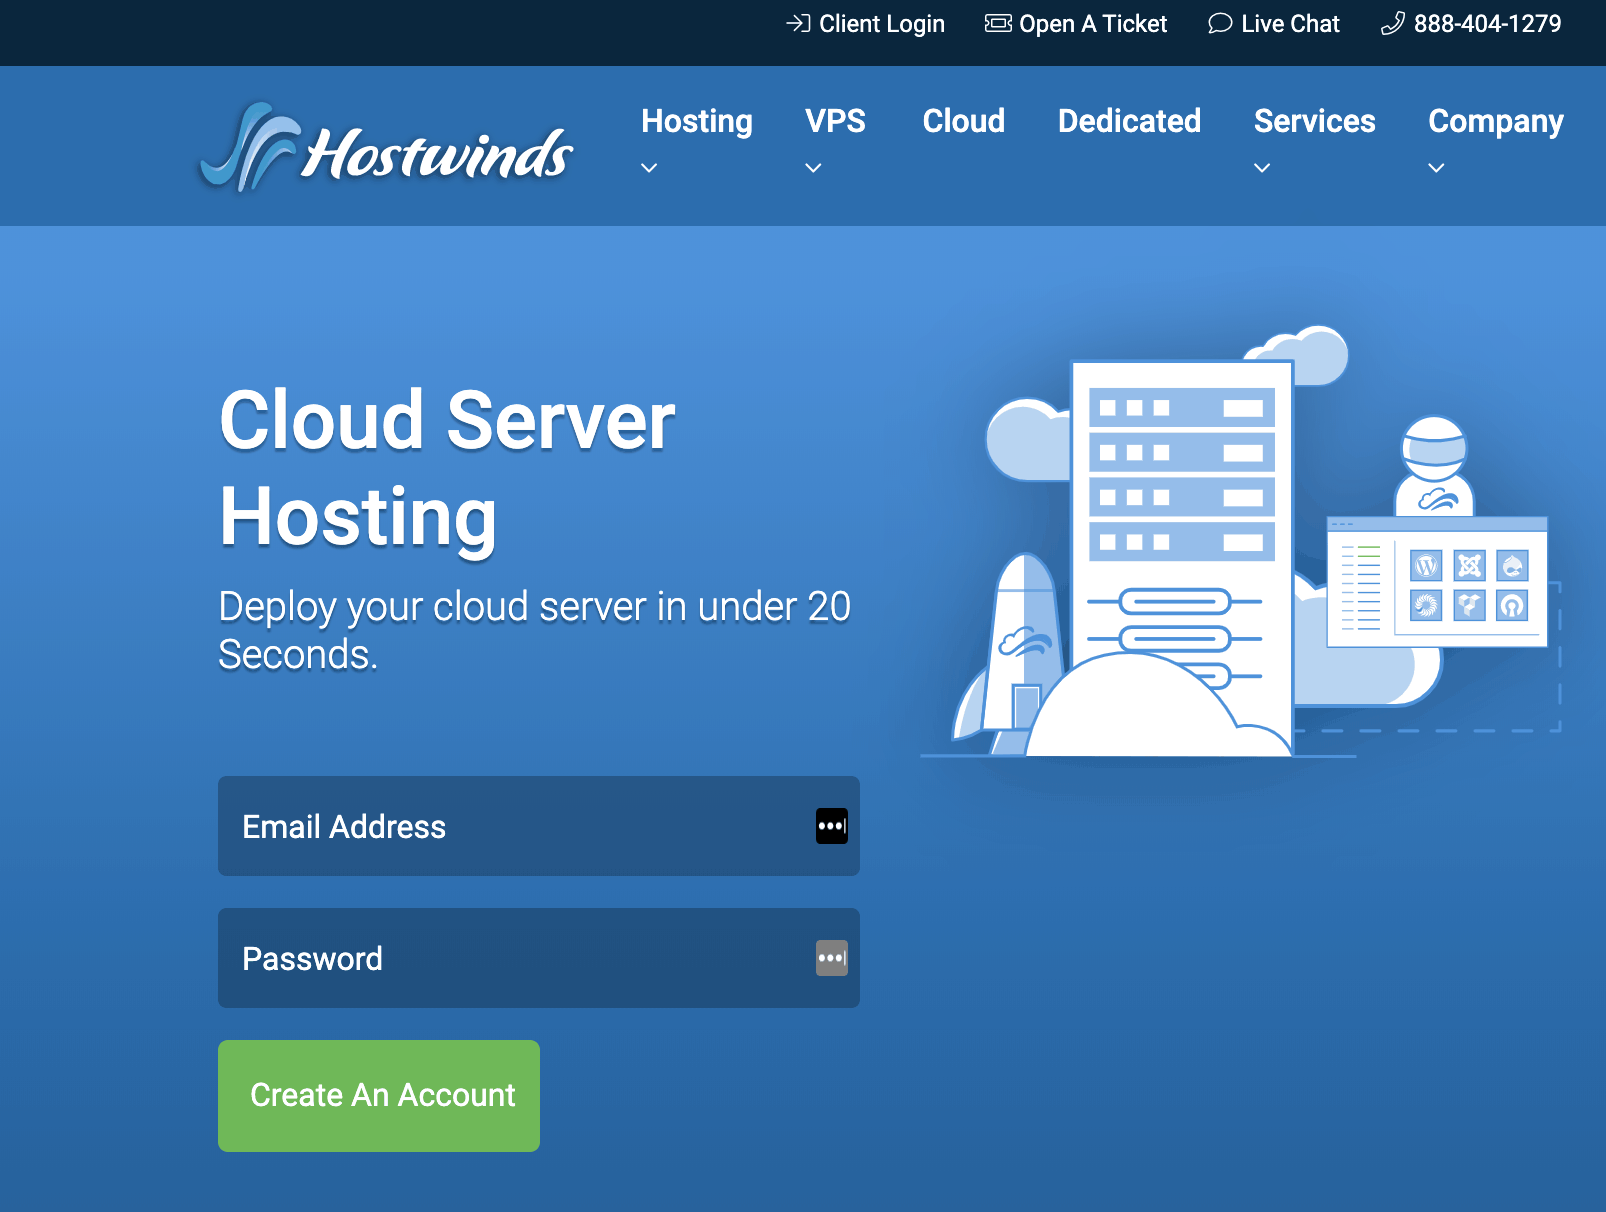 Hostwinds Cloud Server Hosting